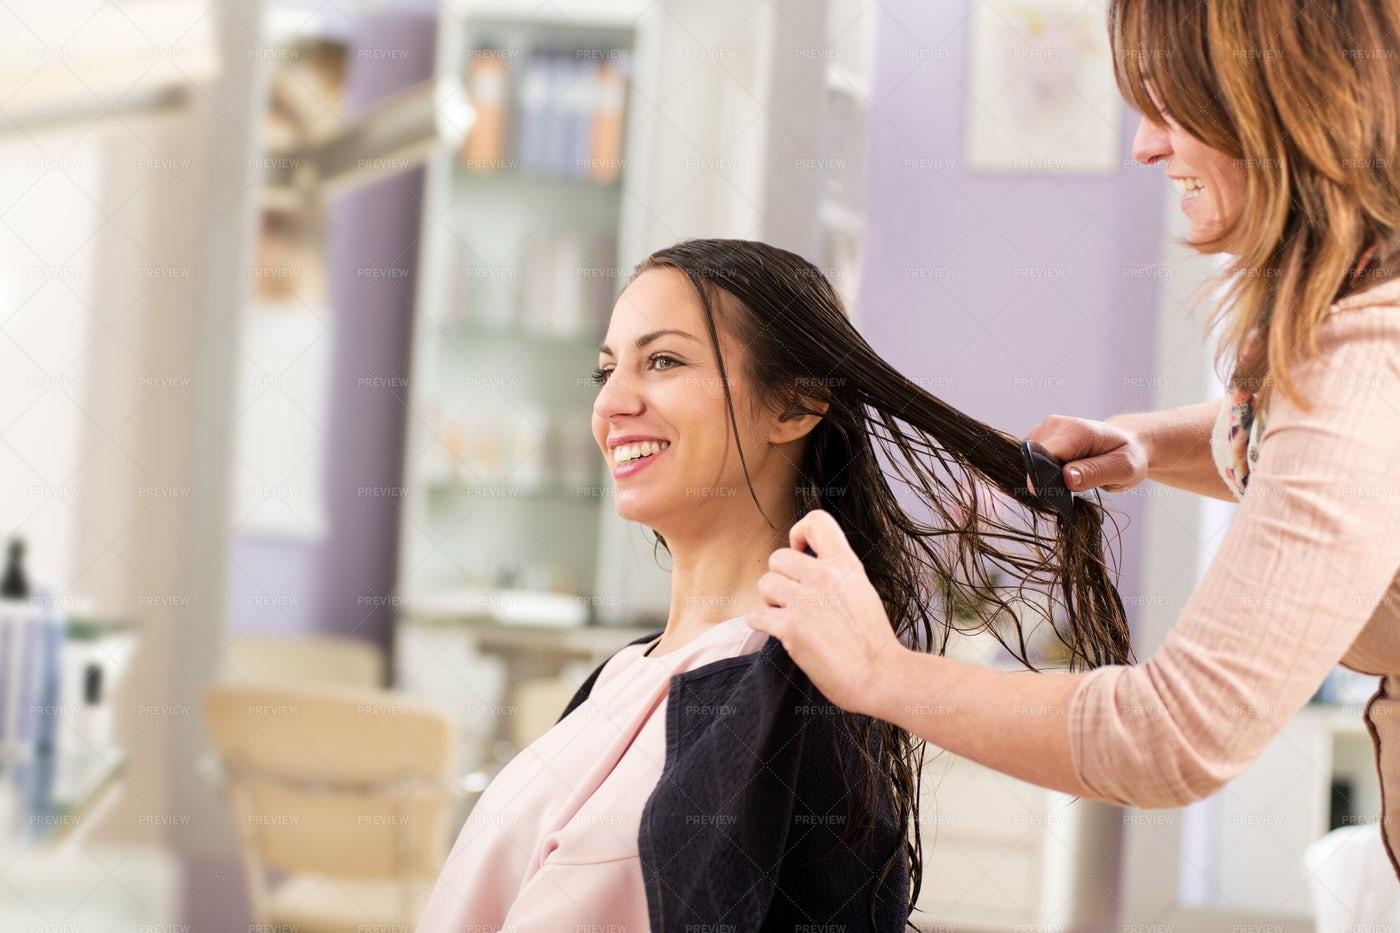 Woman In A Beauty Salon: Stock Photos